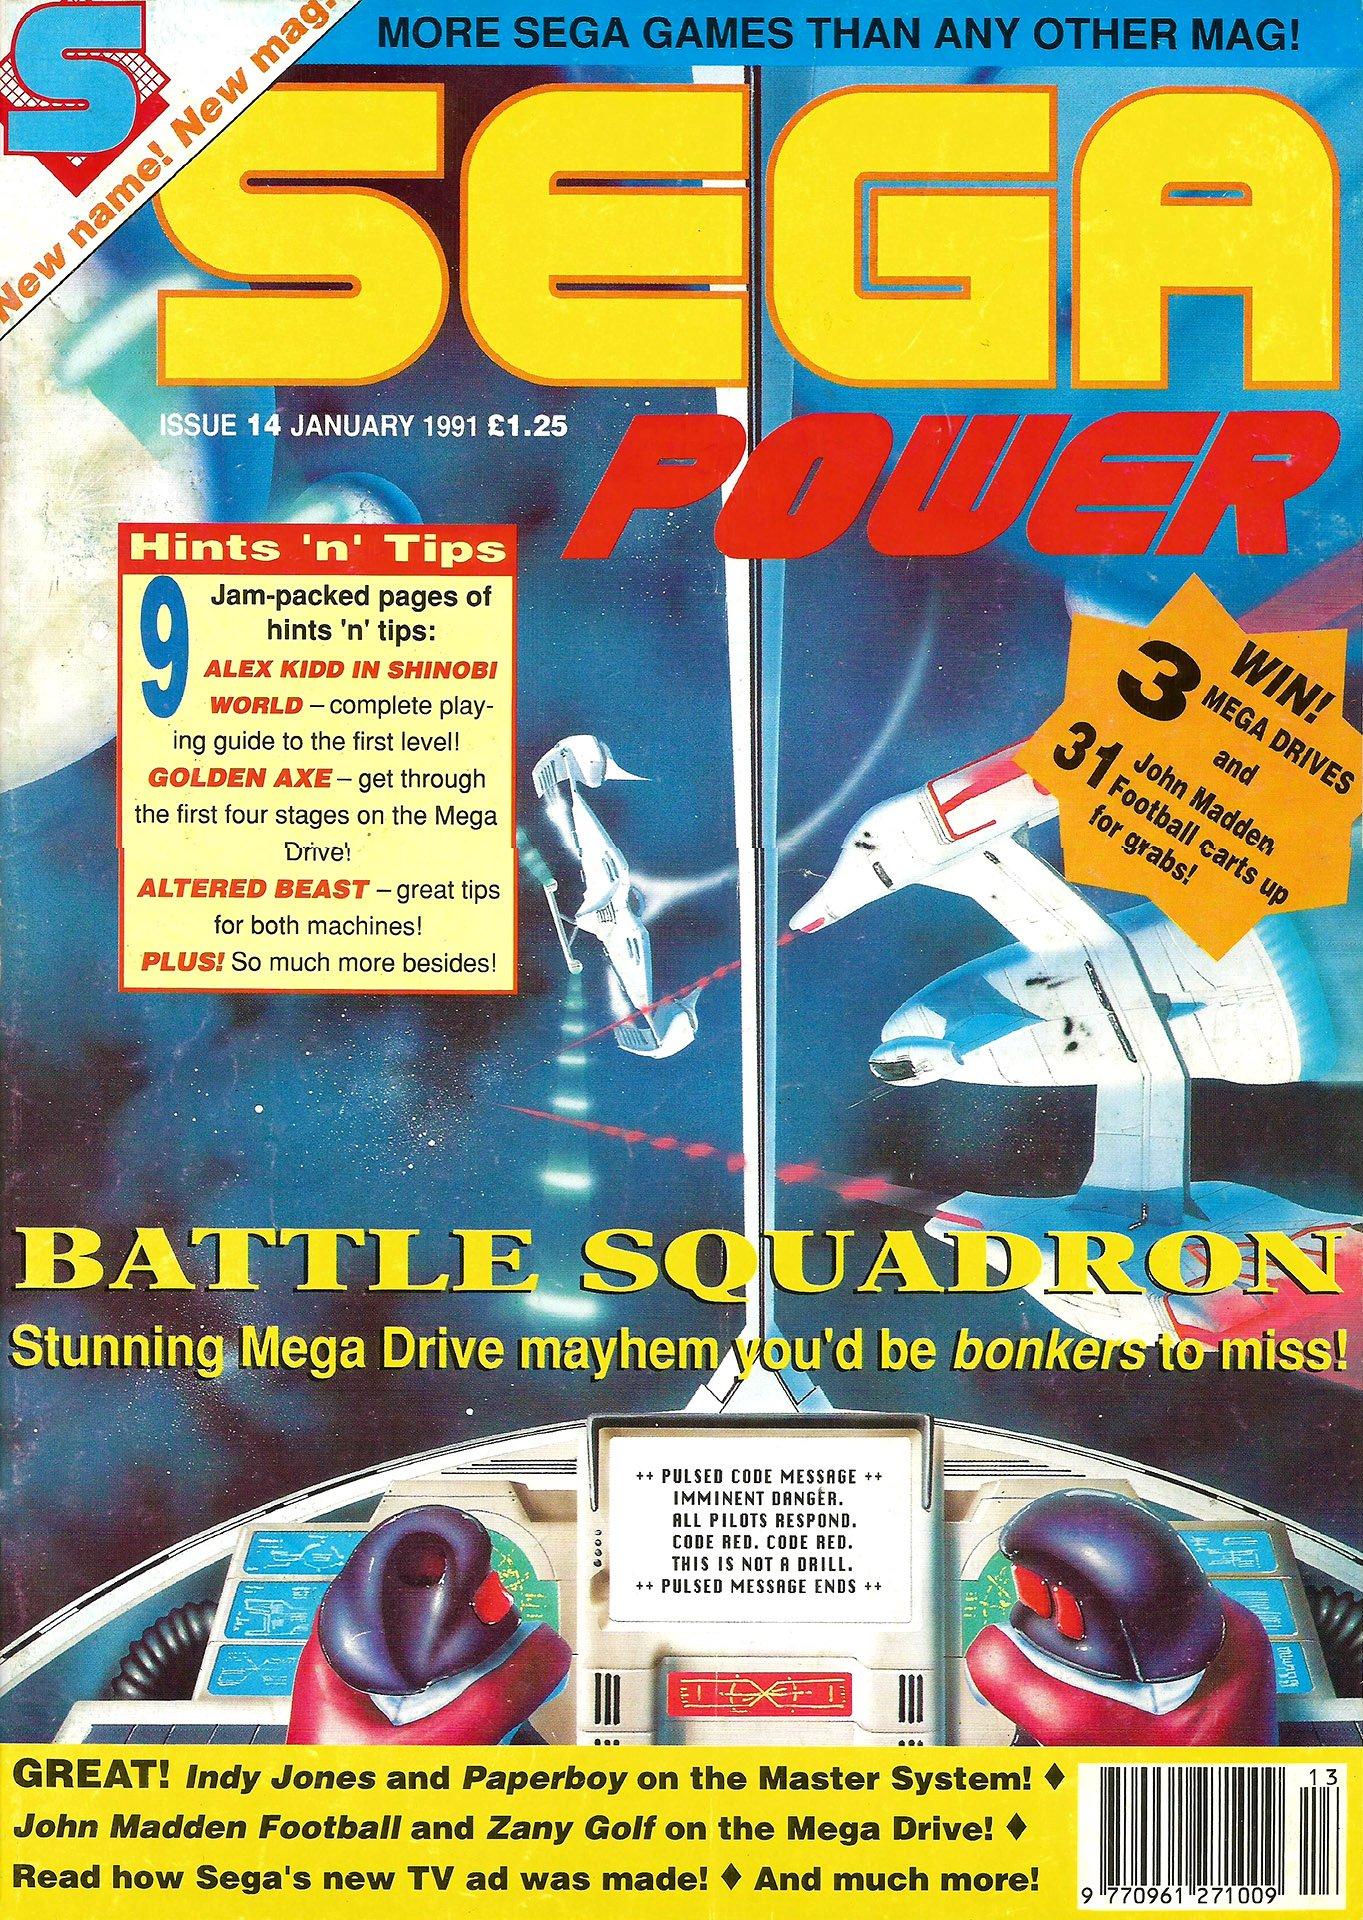 Sega Power Issue 14 (January 1991)